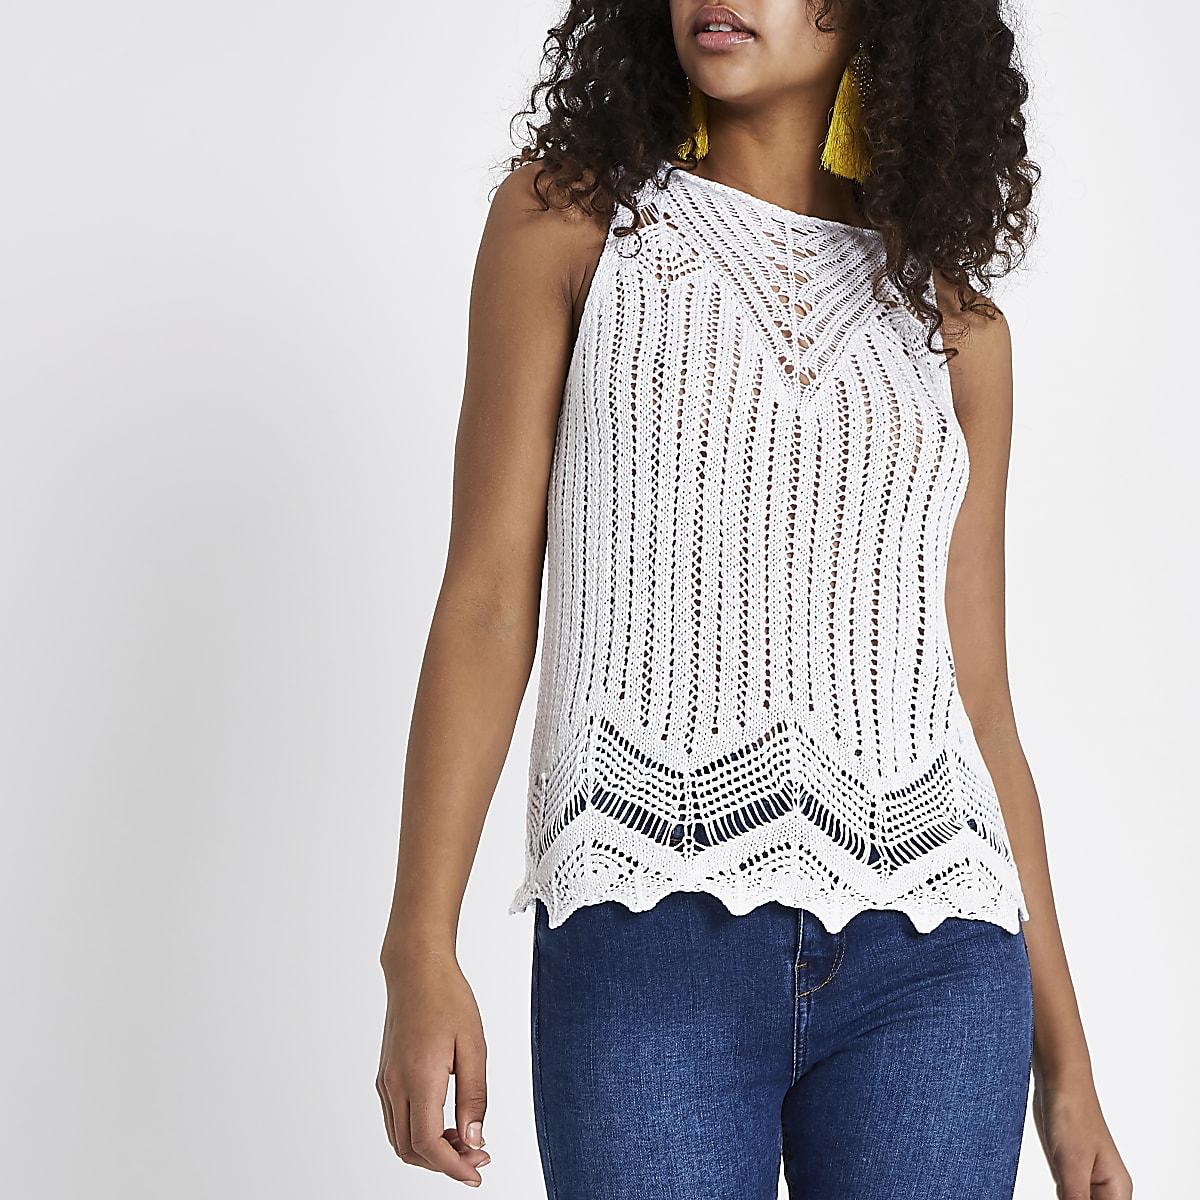 da323b8ced7e1d White crochet tank top - Cami   Sleeveless Tops - Tops - women